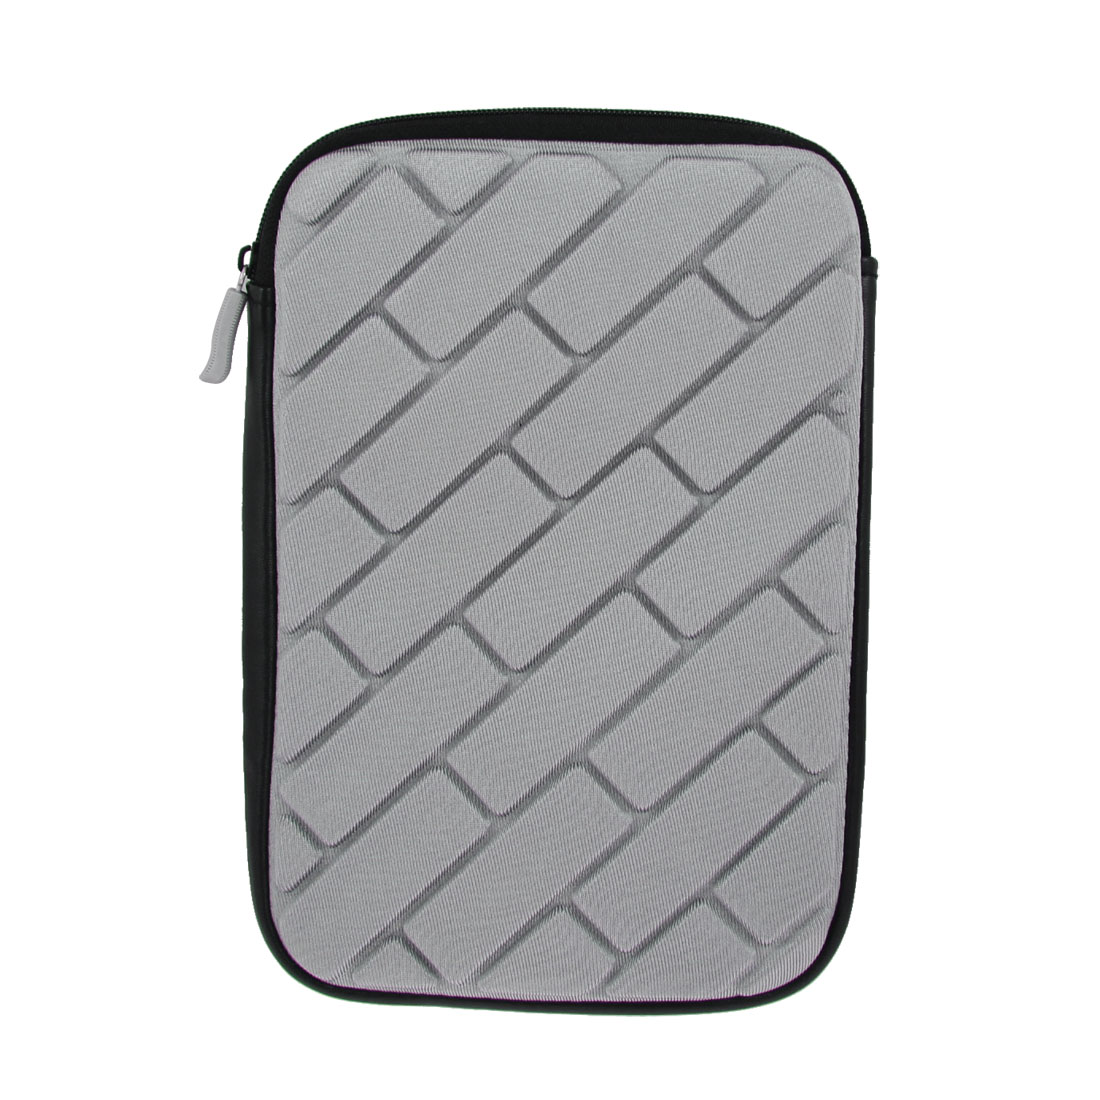 "7"" Tablet Gray Sponge Sleeve Bag Case Pouch"